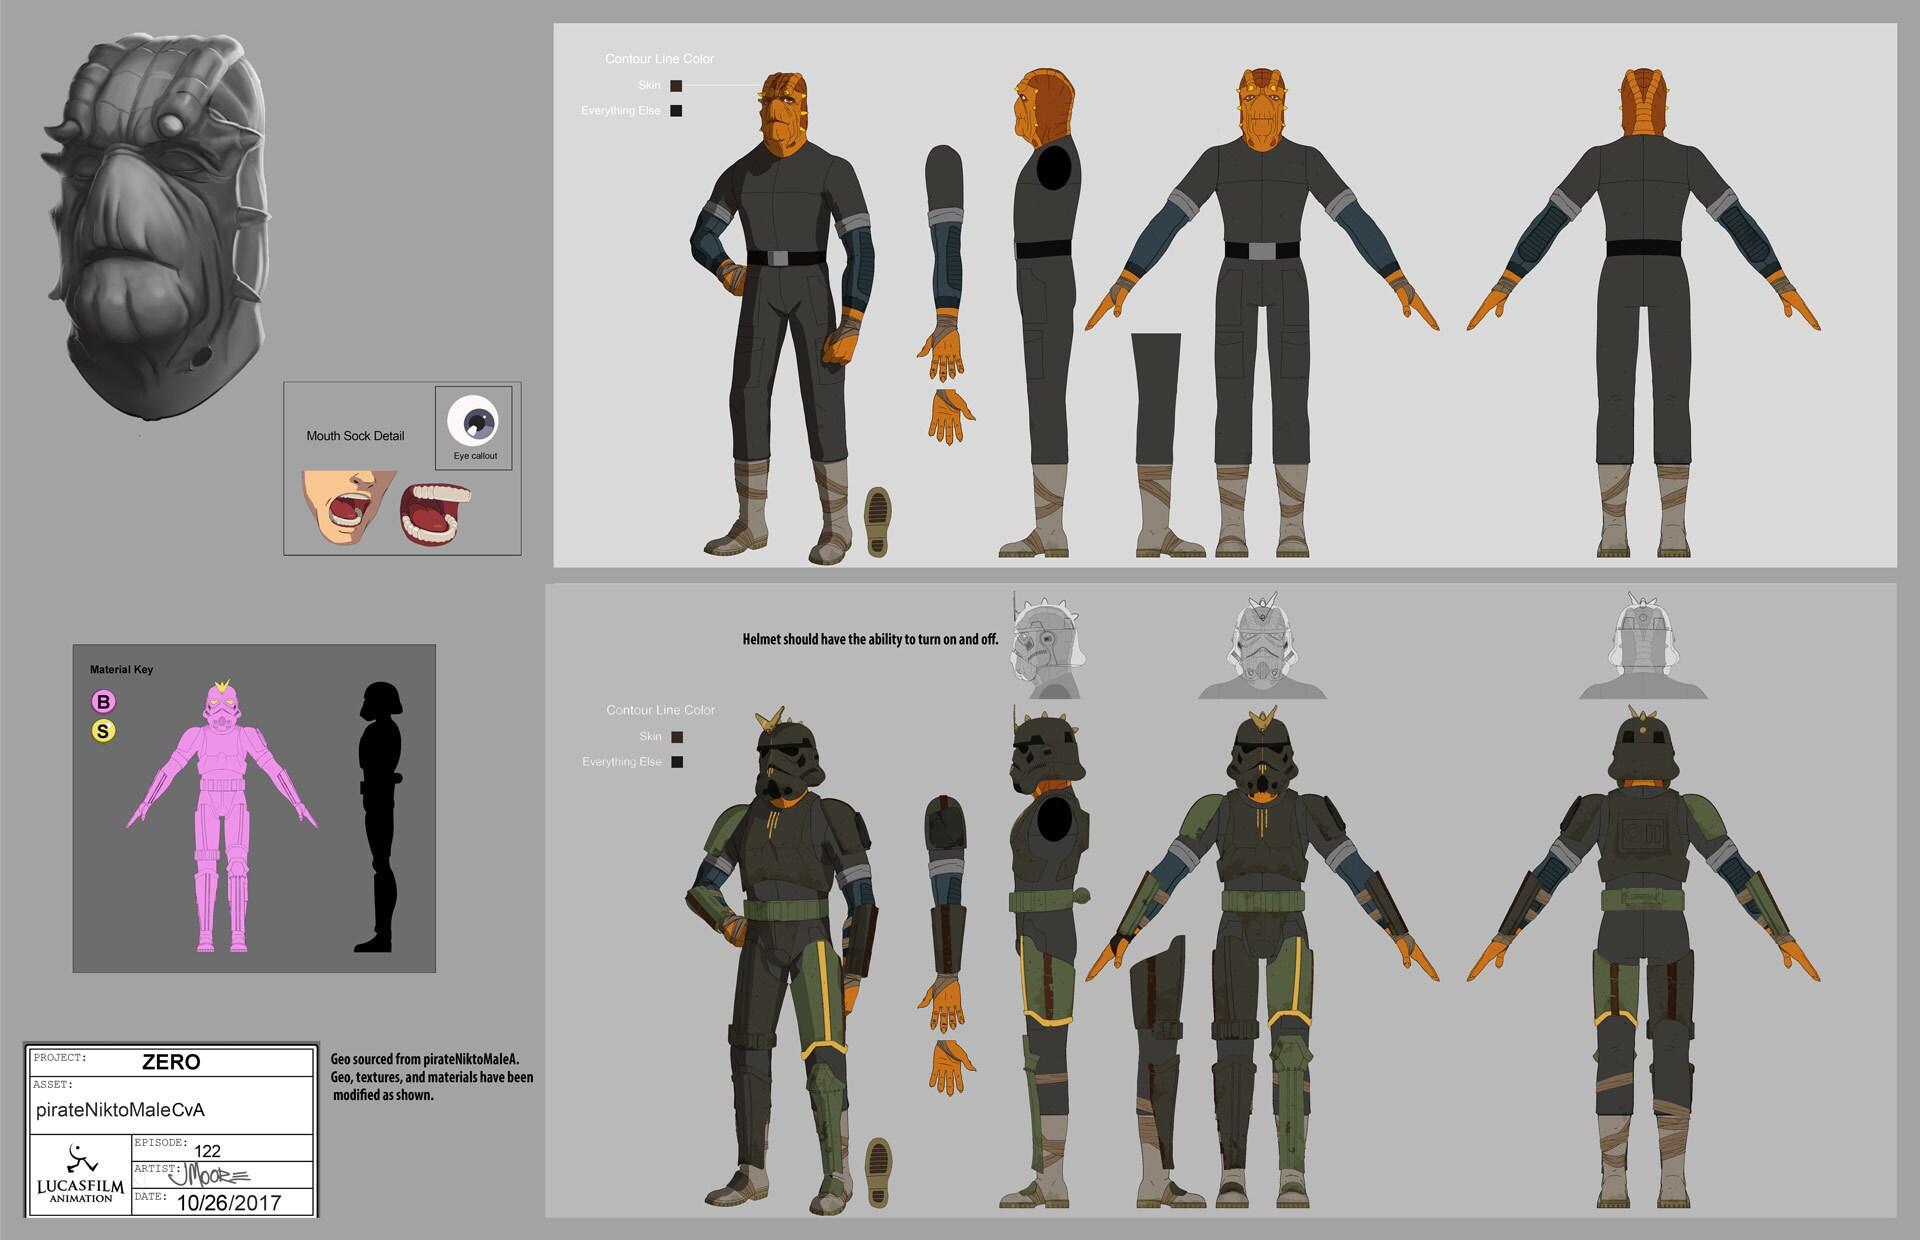 resistance-122-concept-art-gallery-4_f006229a.jpeg?region=0%2C0%2C1920%2C1240